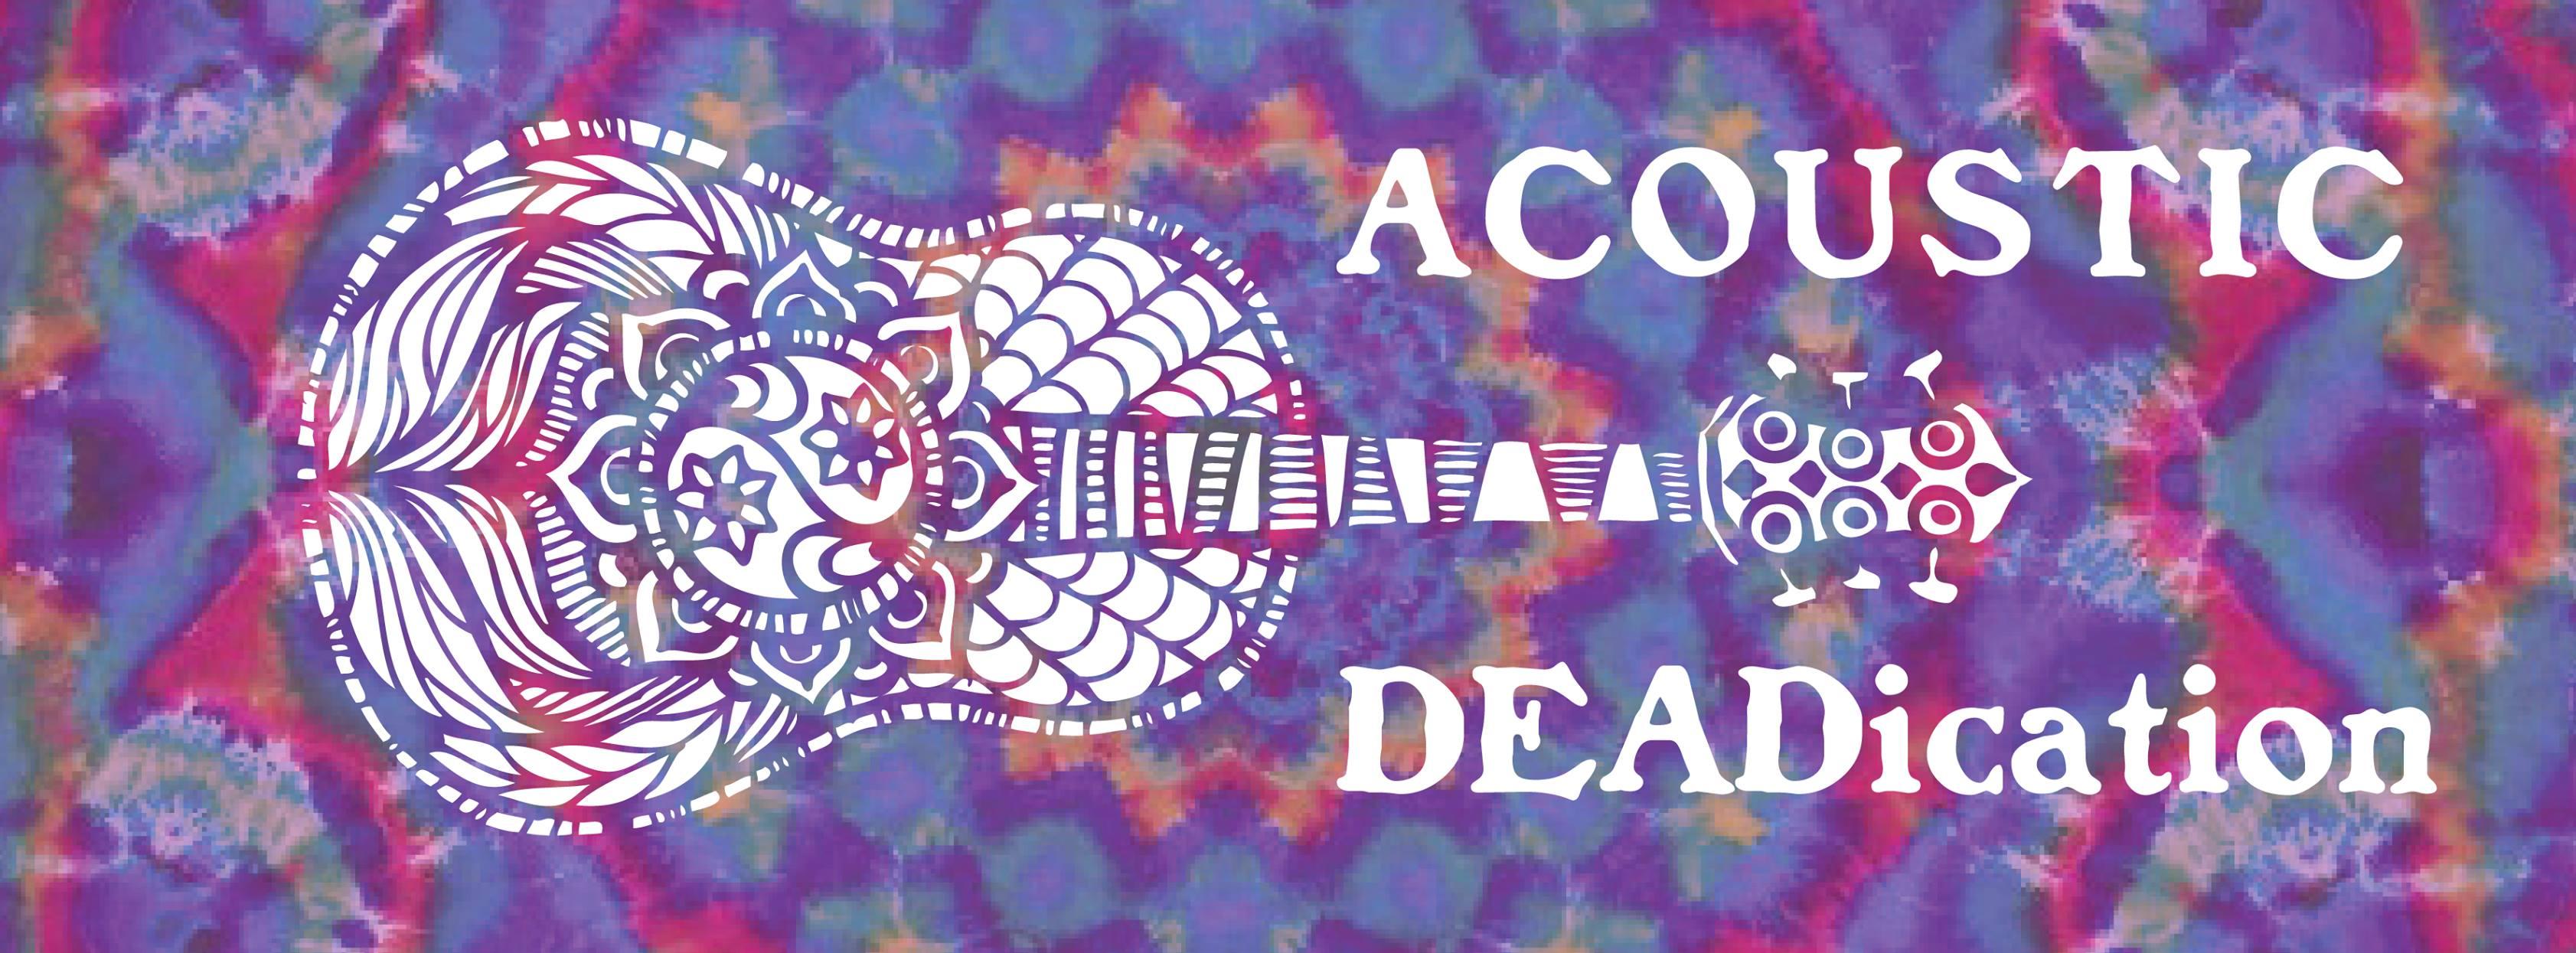 Acoustic deadication